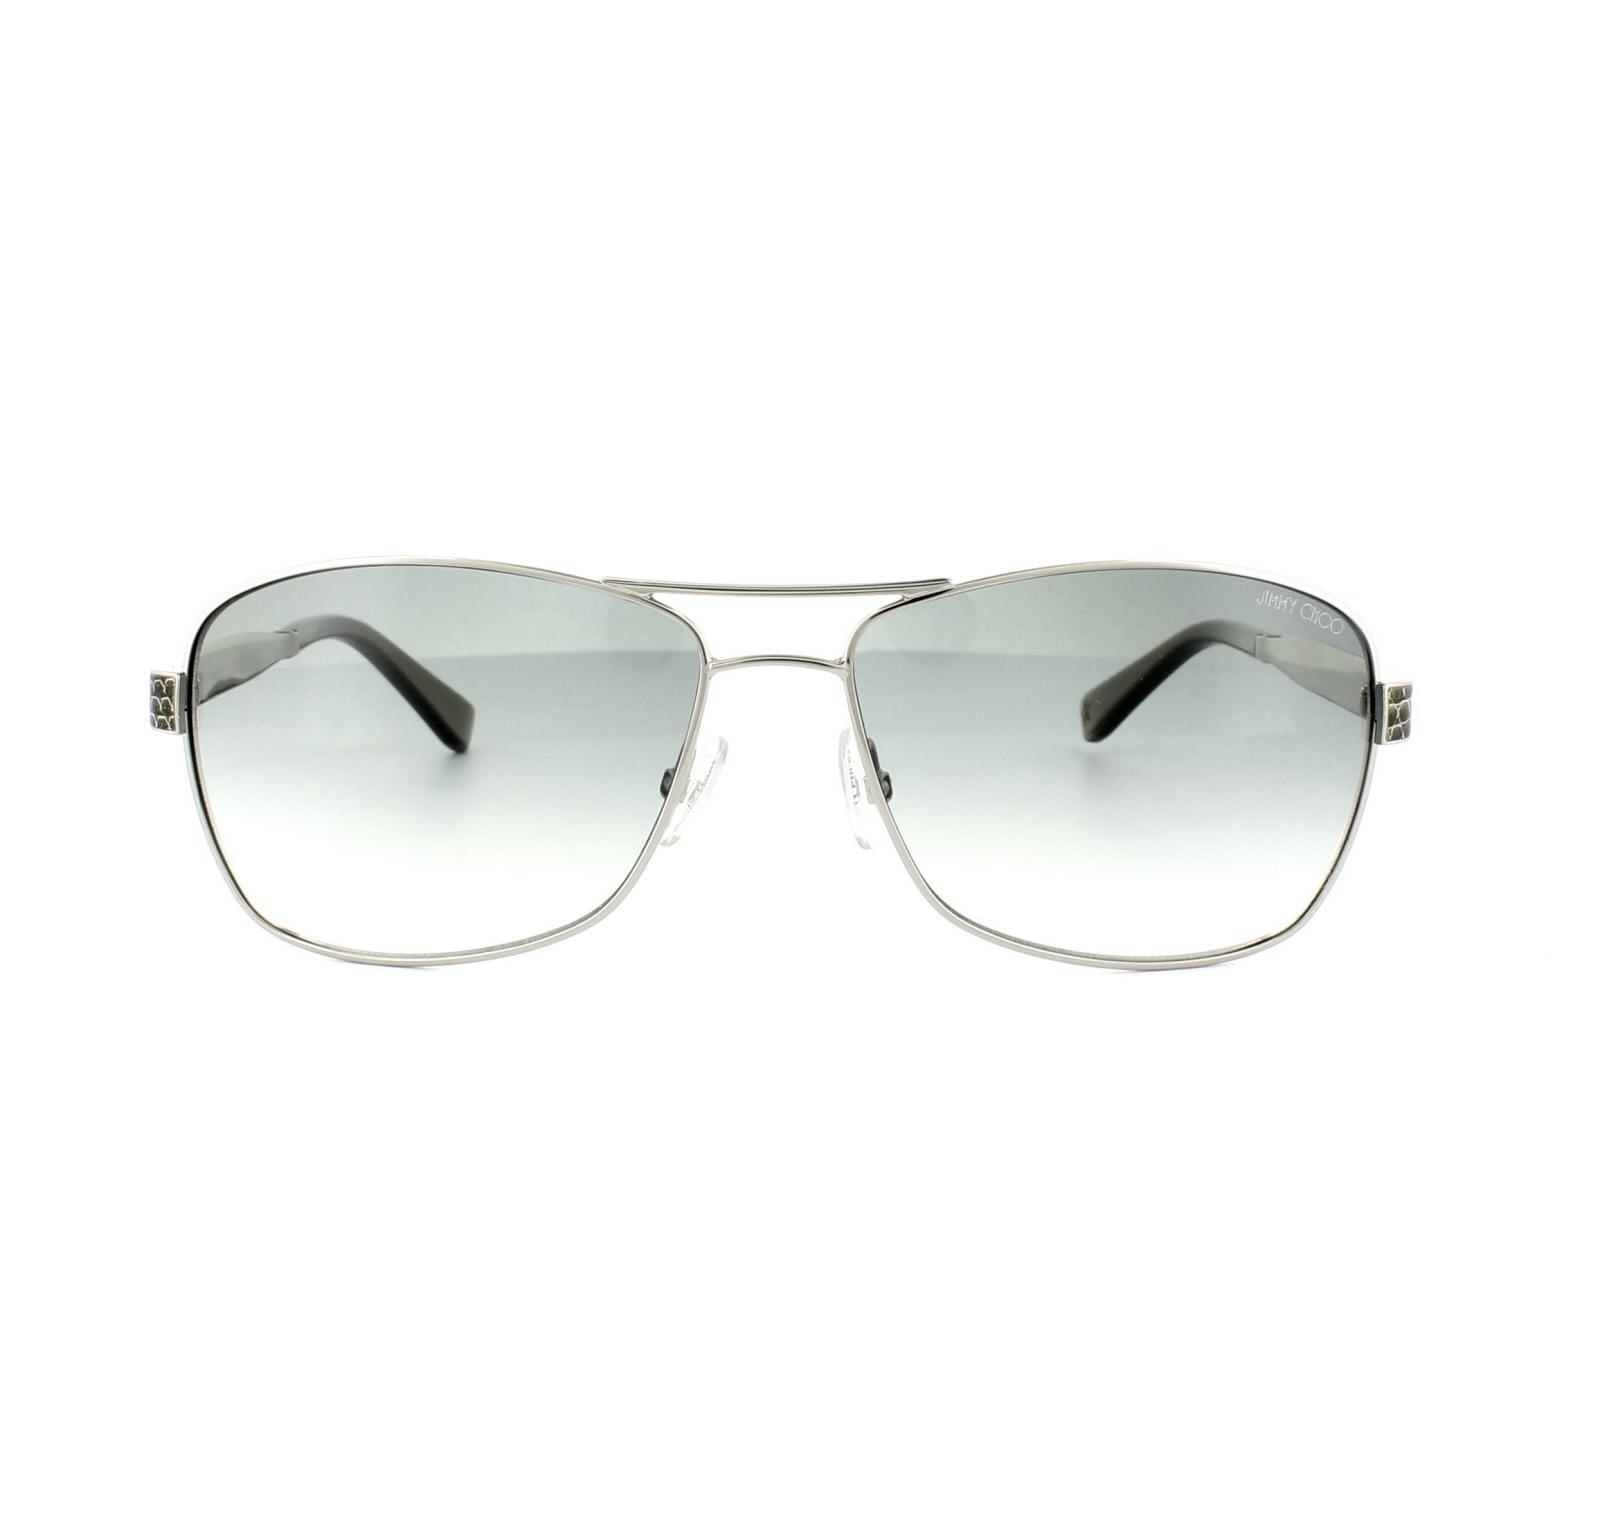 a000f5ec6f19 Sentinel Jimmy Choo Sunglasses Cris 010 YR Palladium Grey Green Gradient